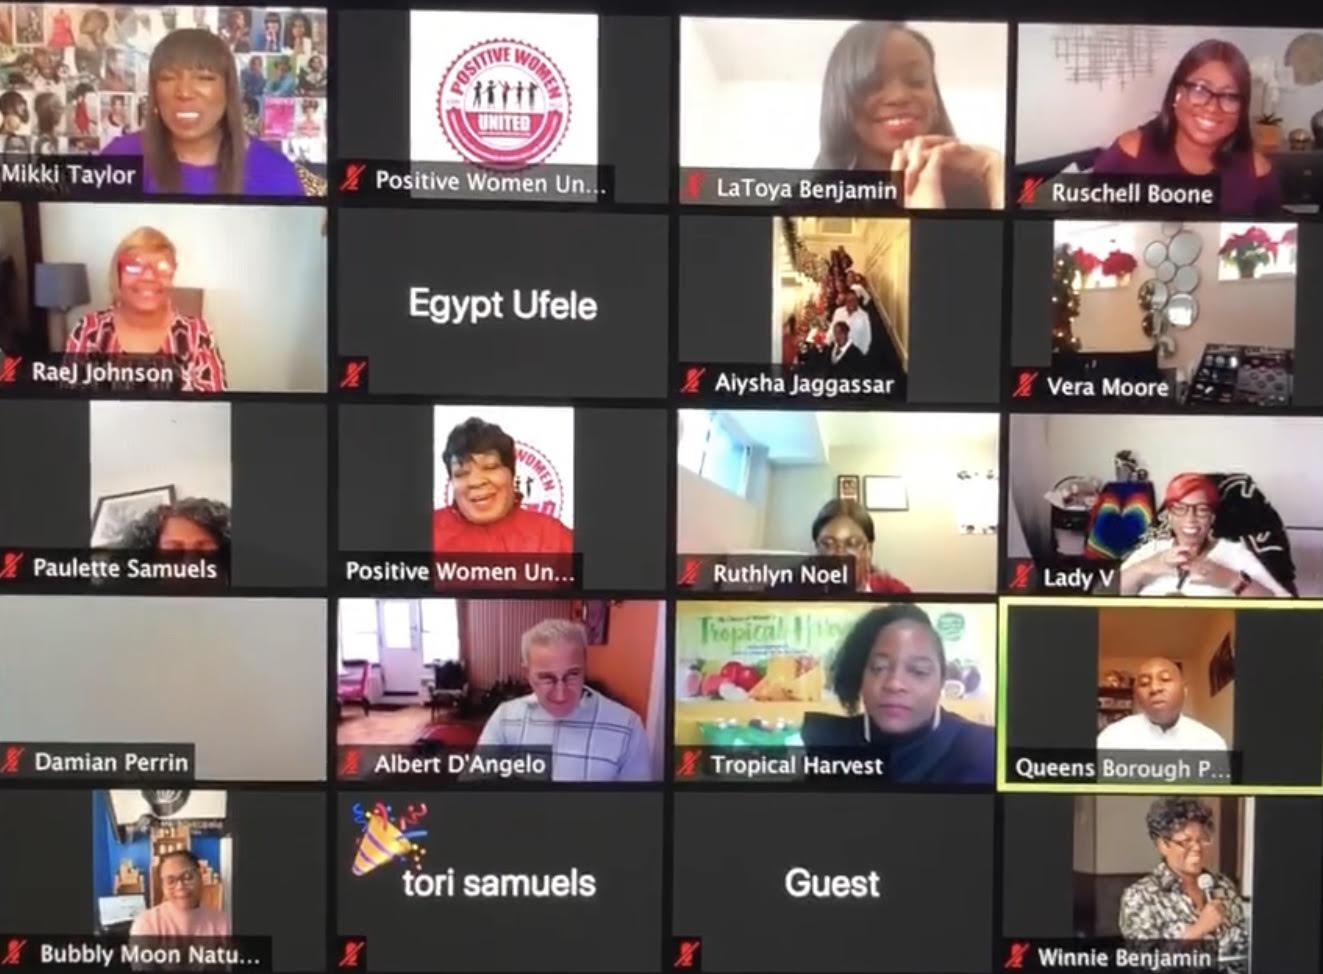 Celebrating Empowering Women Virtual Holiday Expo Dec. 19, 2020 and Caribbean Impact Life Virtual Awards Honoree on February 18, 2021